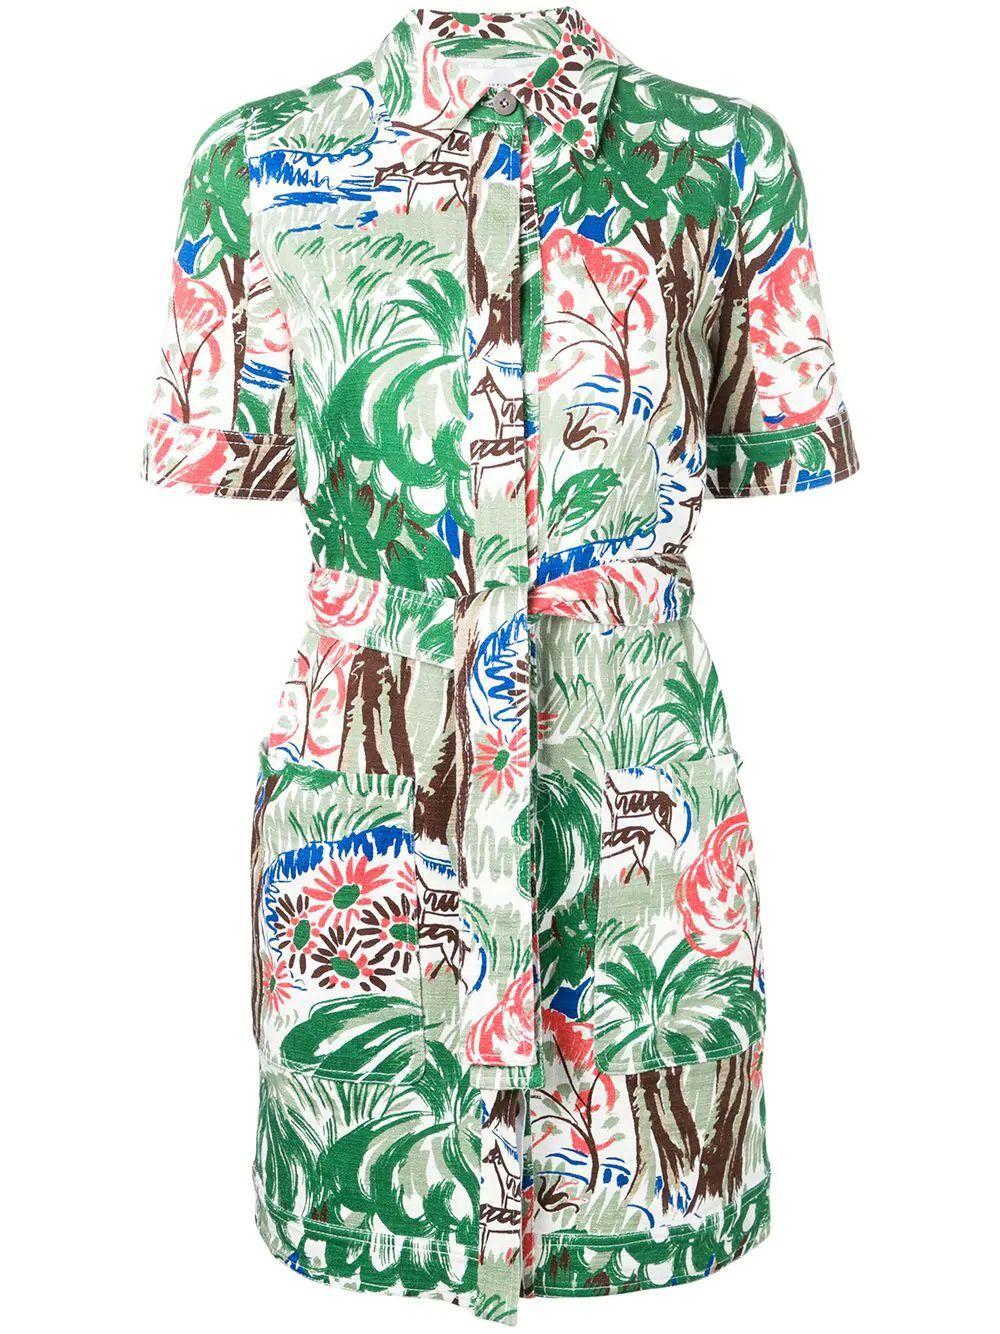 Short Sleeve Jungle Print Cotton Shirt Dress Item # DRVV675-PAW19